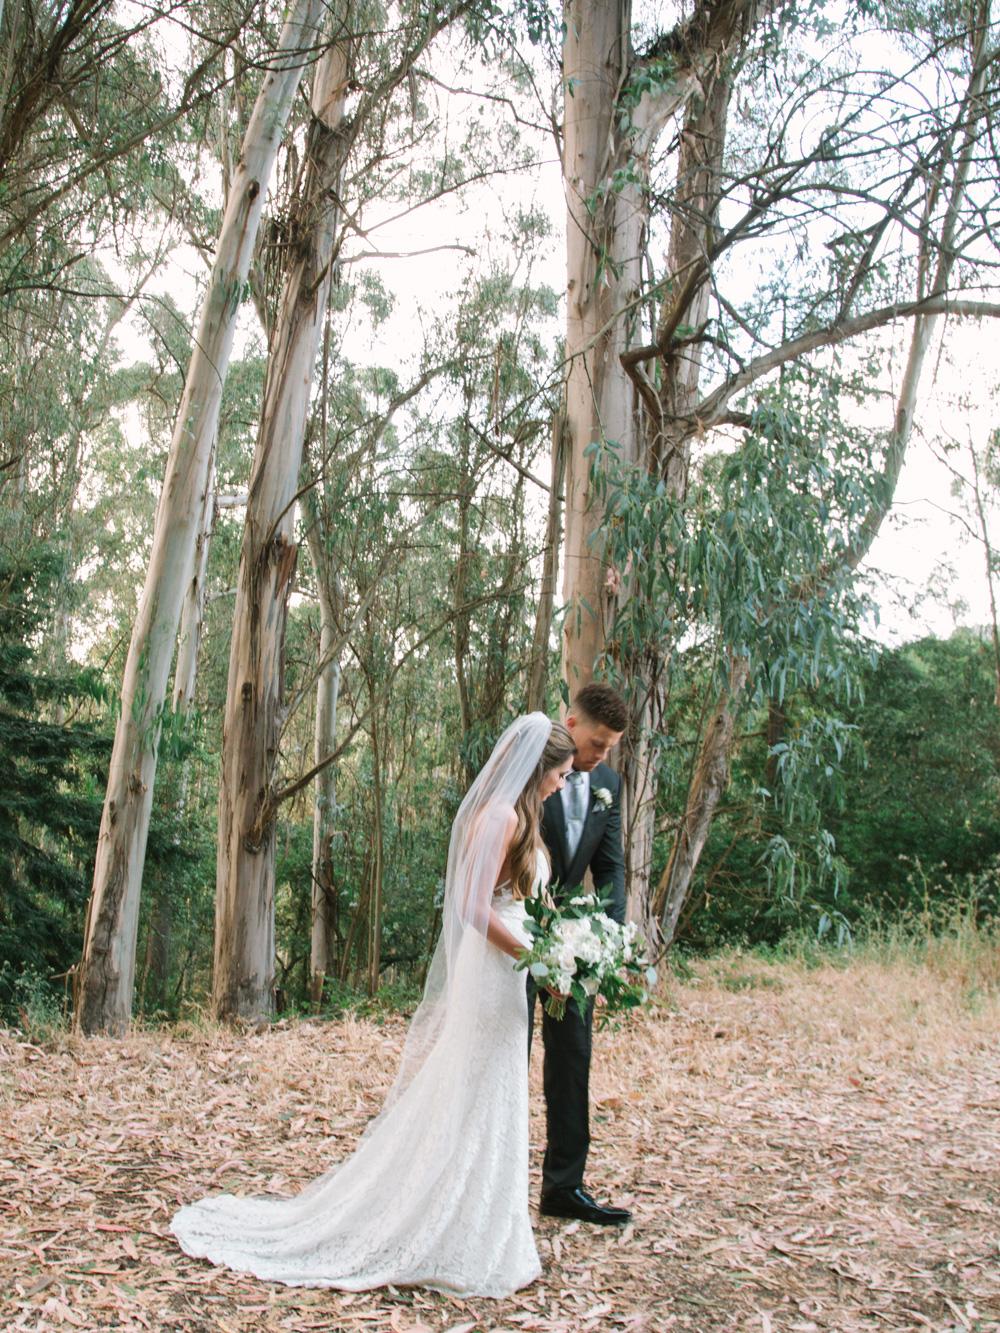 kateweinsteinphoto_korn_wedding-185.jpg